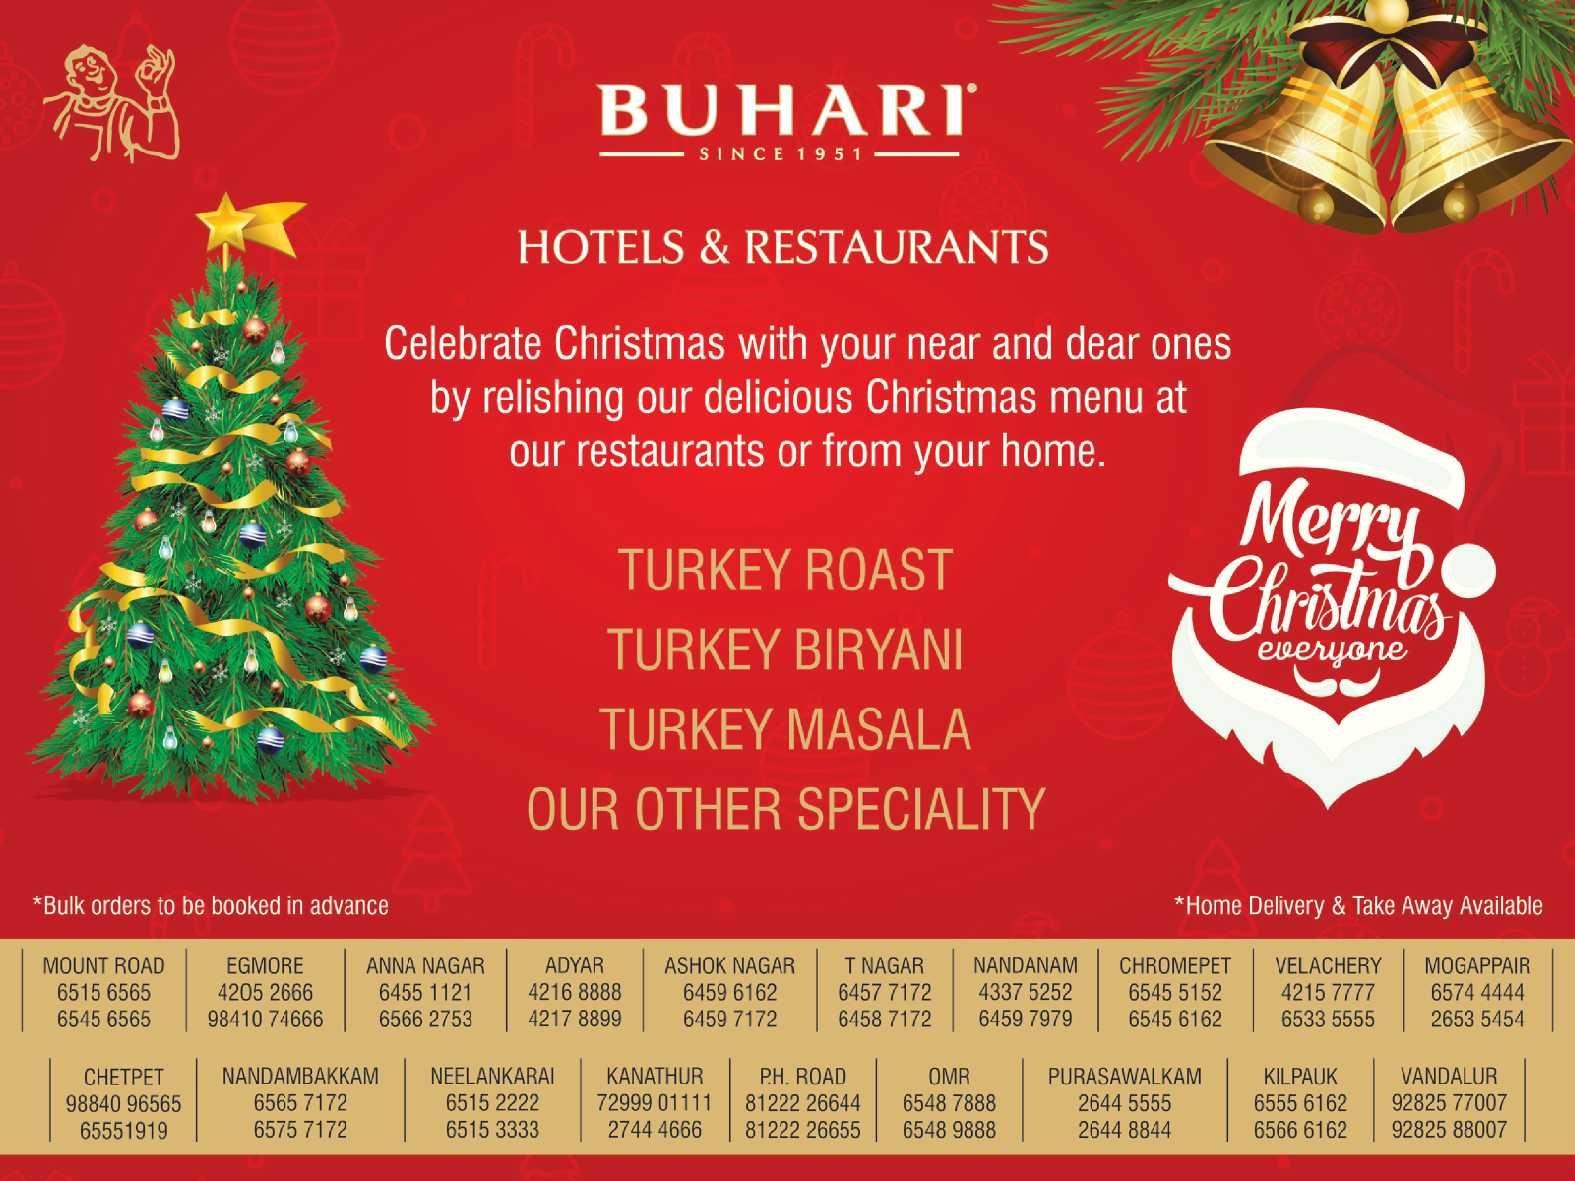 Buhari Hotels And Restaurants Ad The Hindu Chennai Check Out More Hotels Restaurants Advertisement Advertisement Collection Restaurant Ad Restaurant Hotel